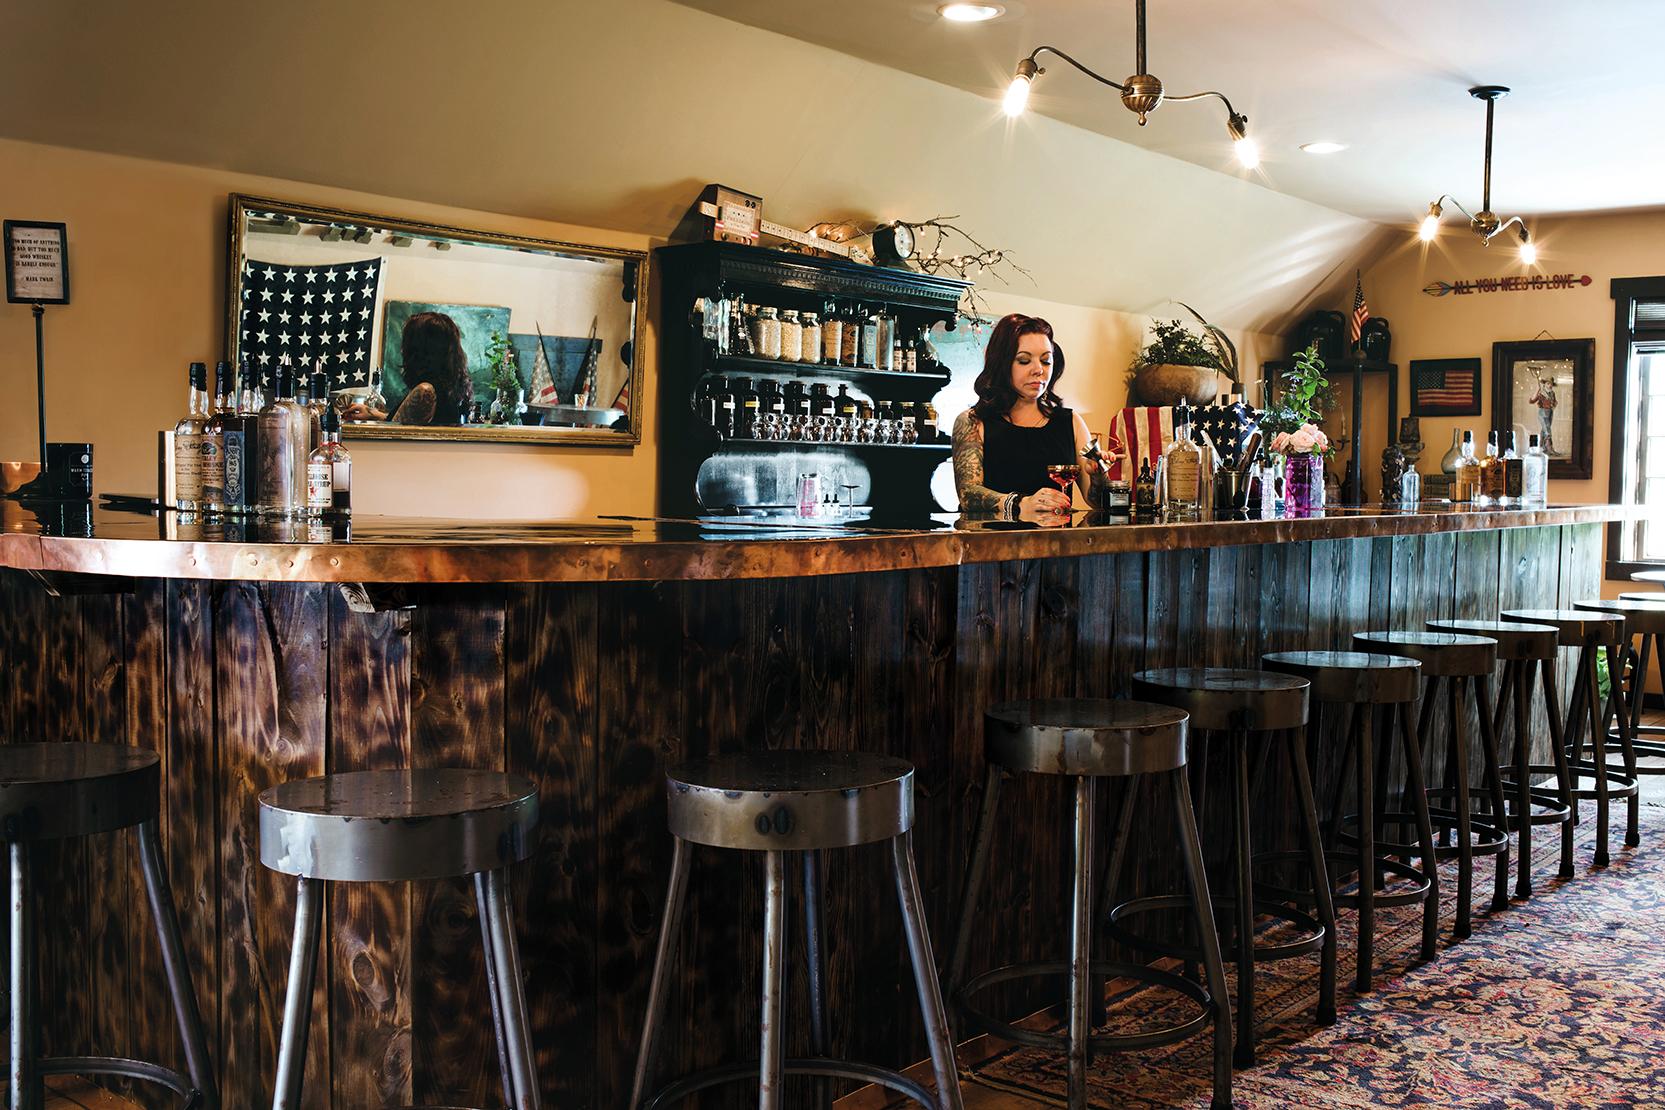 The Indian Creek Distilling bar